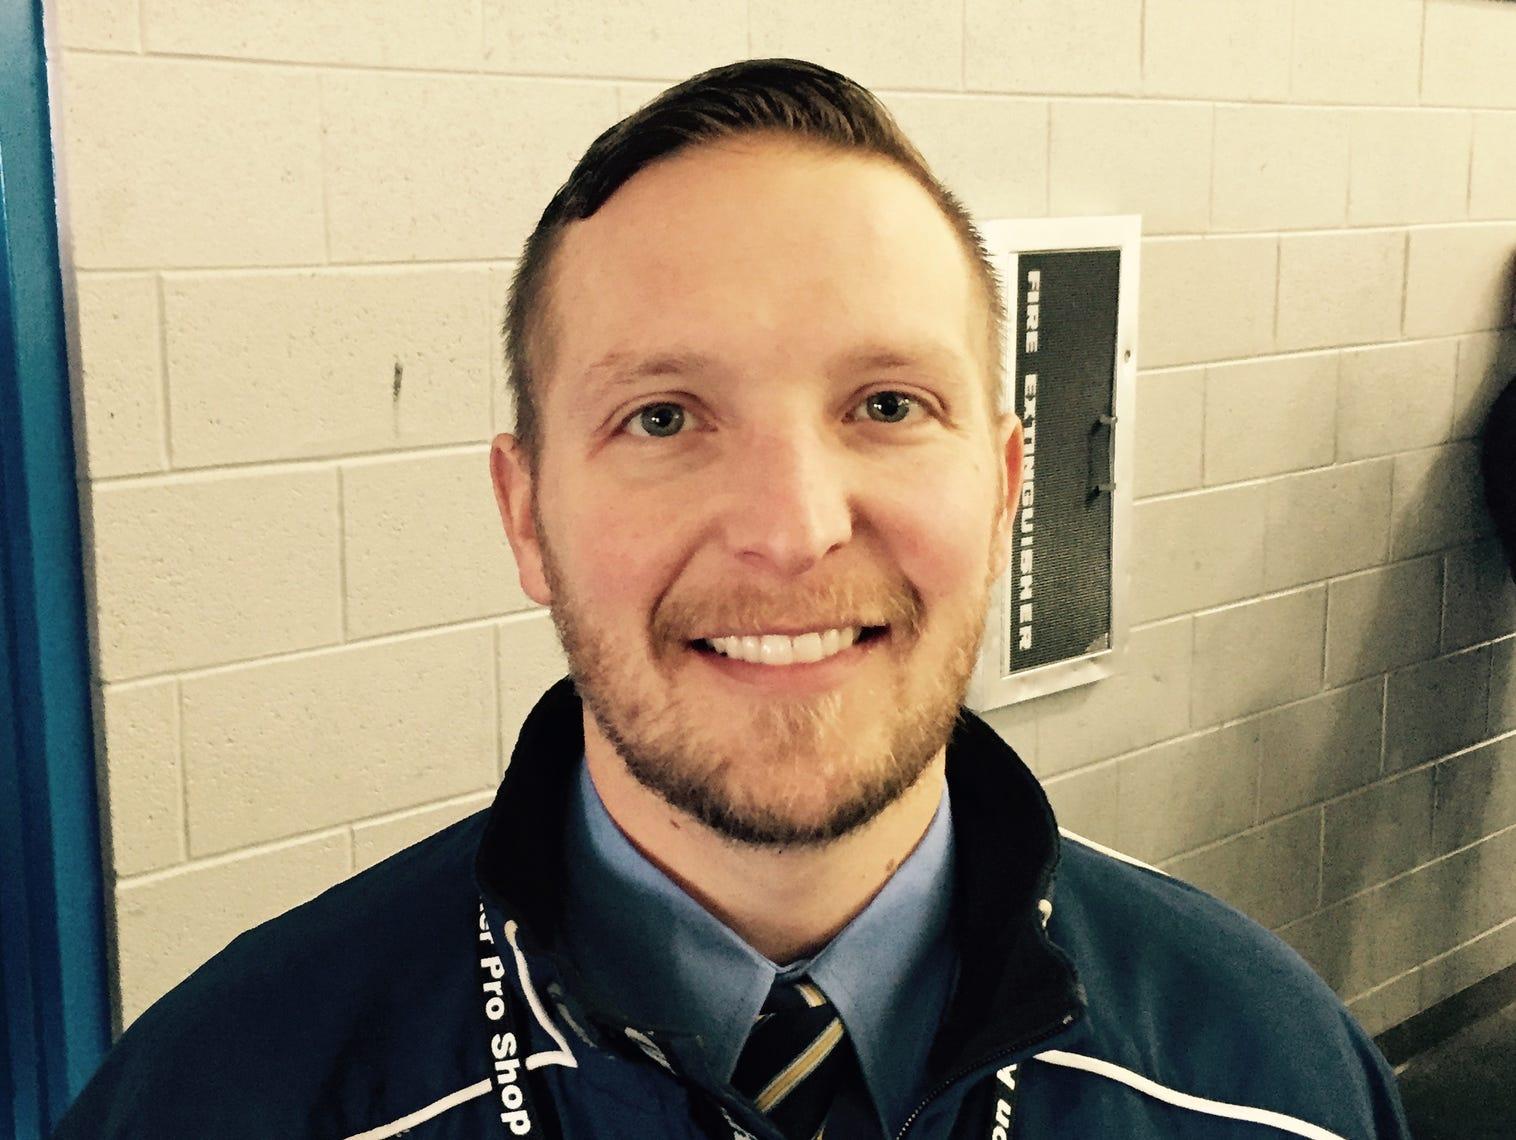 Trenton coach Chad Clements